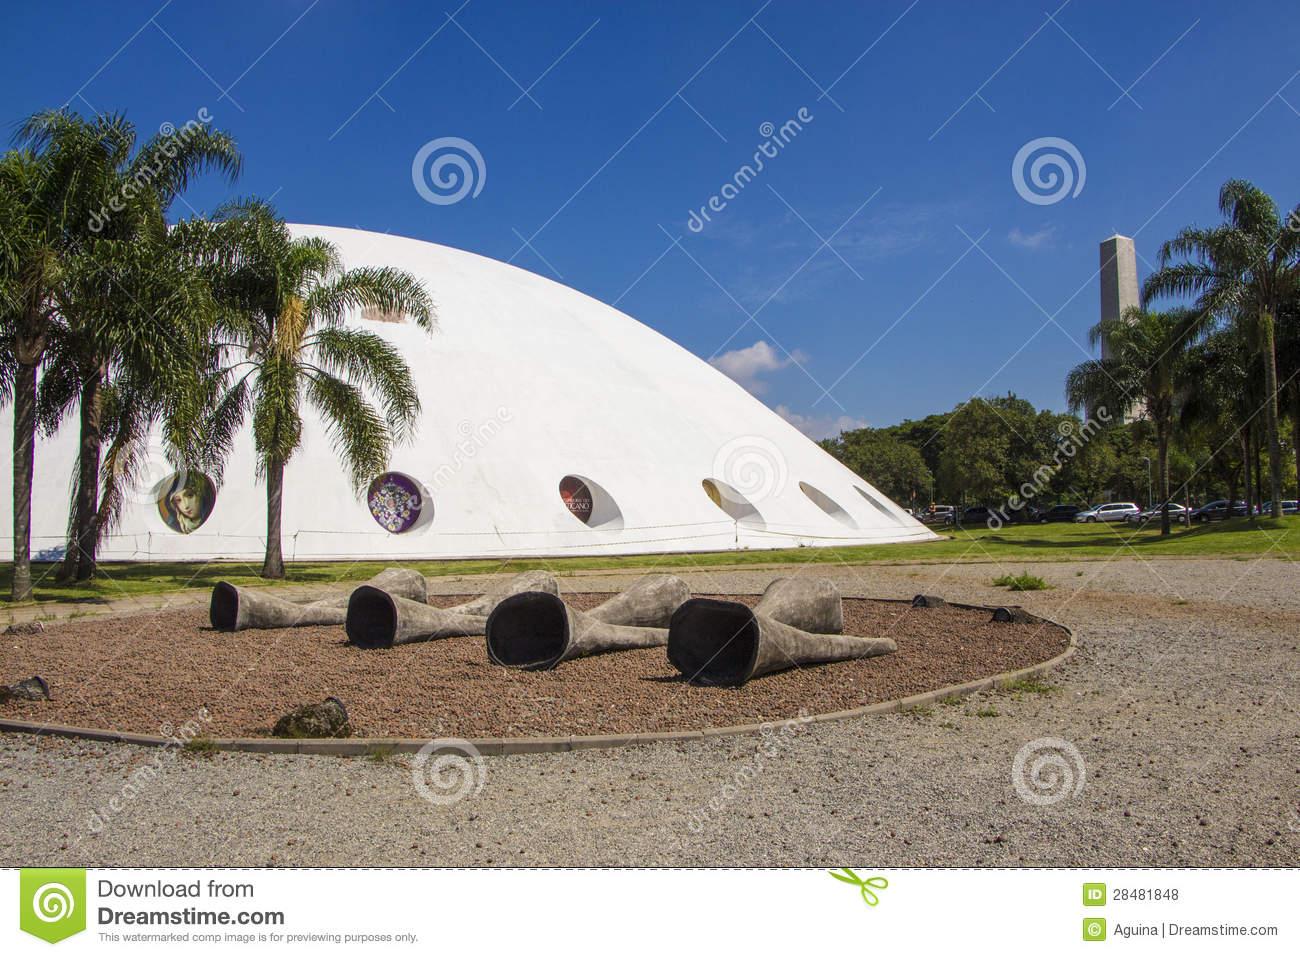 The Oca (Hut).